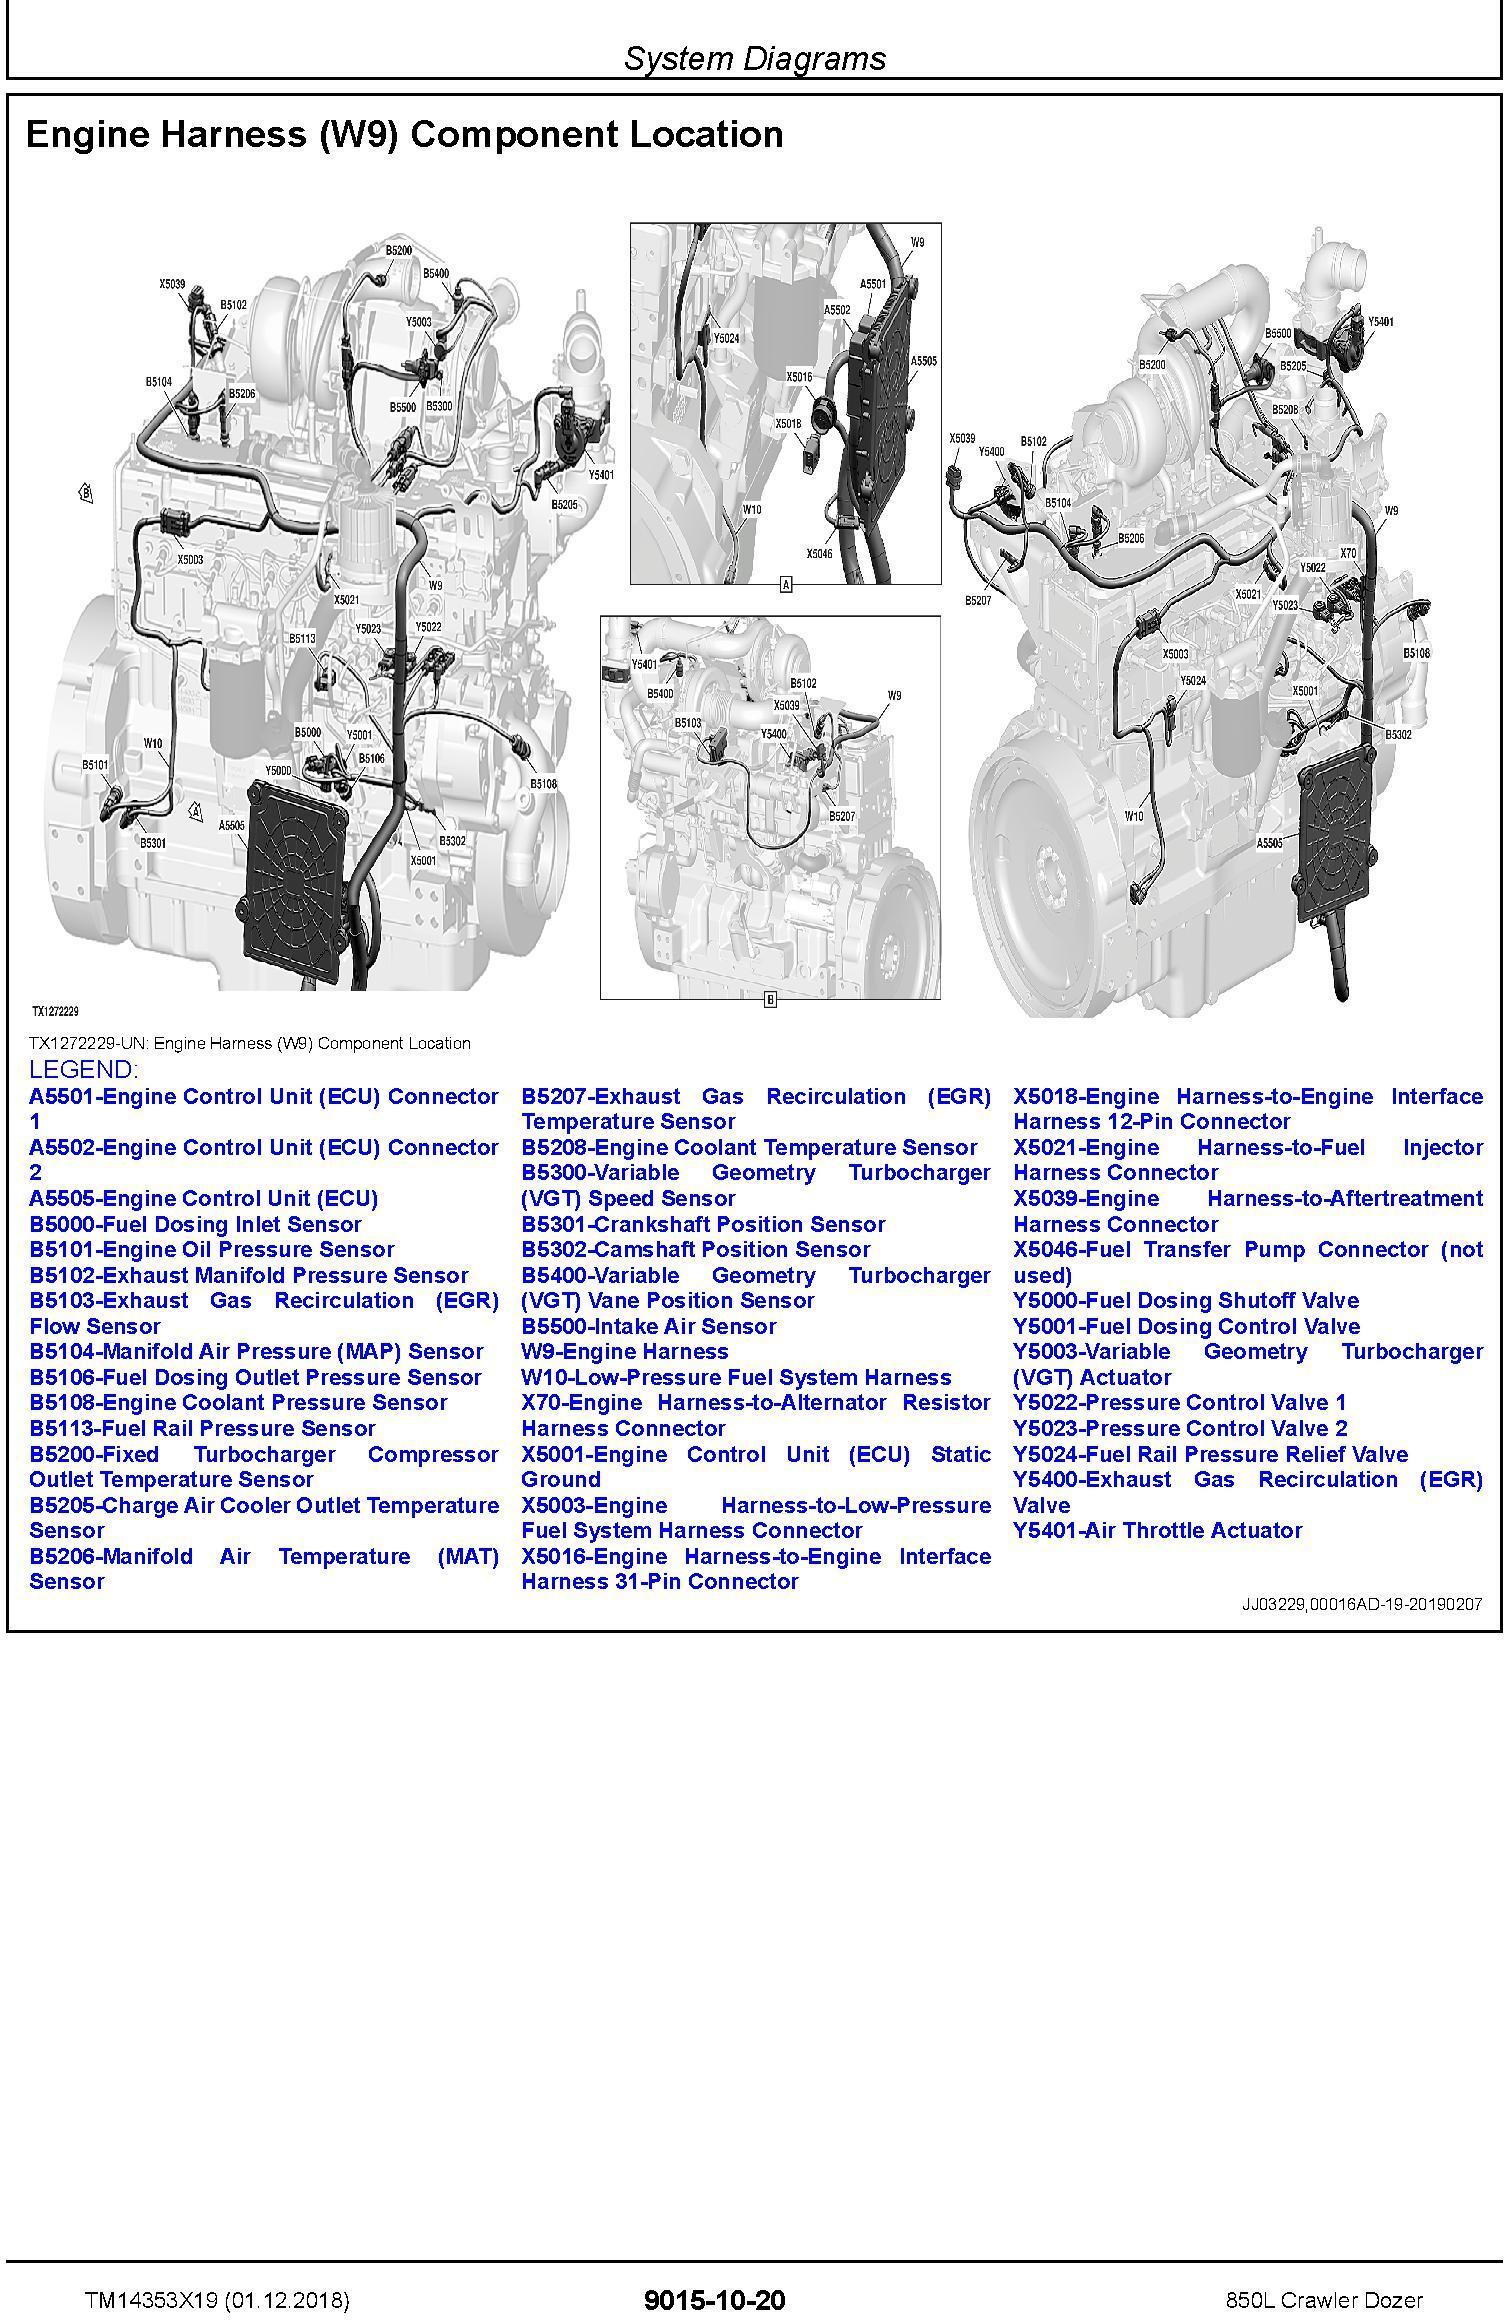 John Deere 850L Crawler Dozer Operation & Test Technical Manual (TM14353X19) - 1